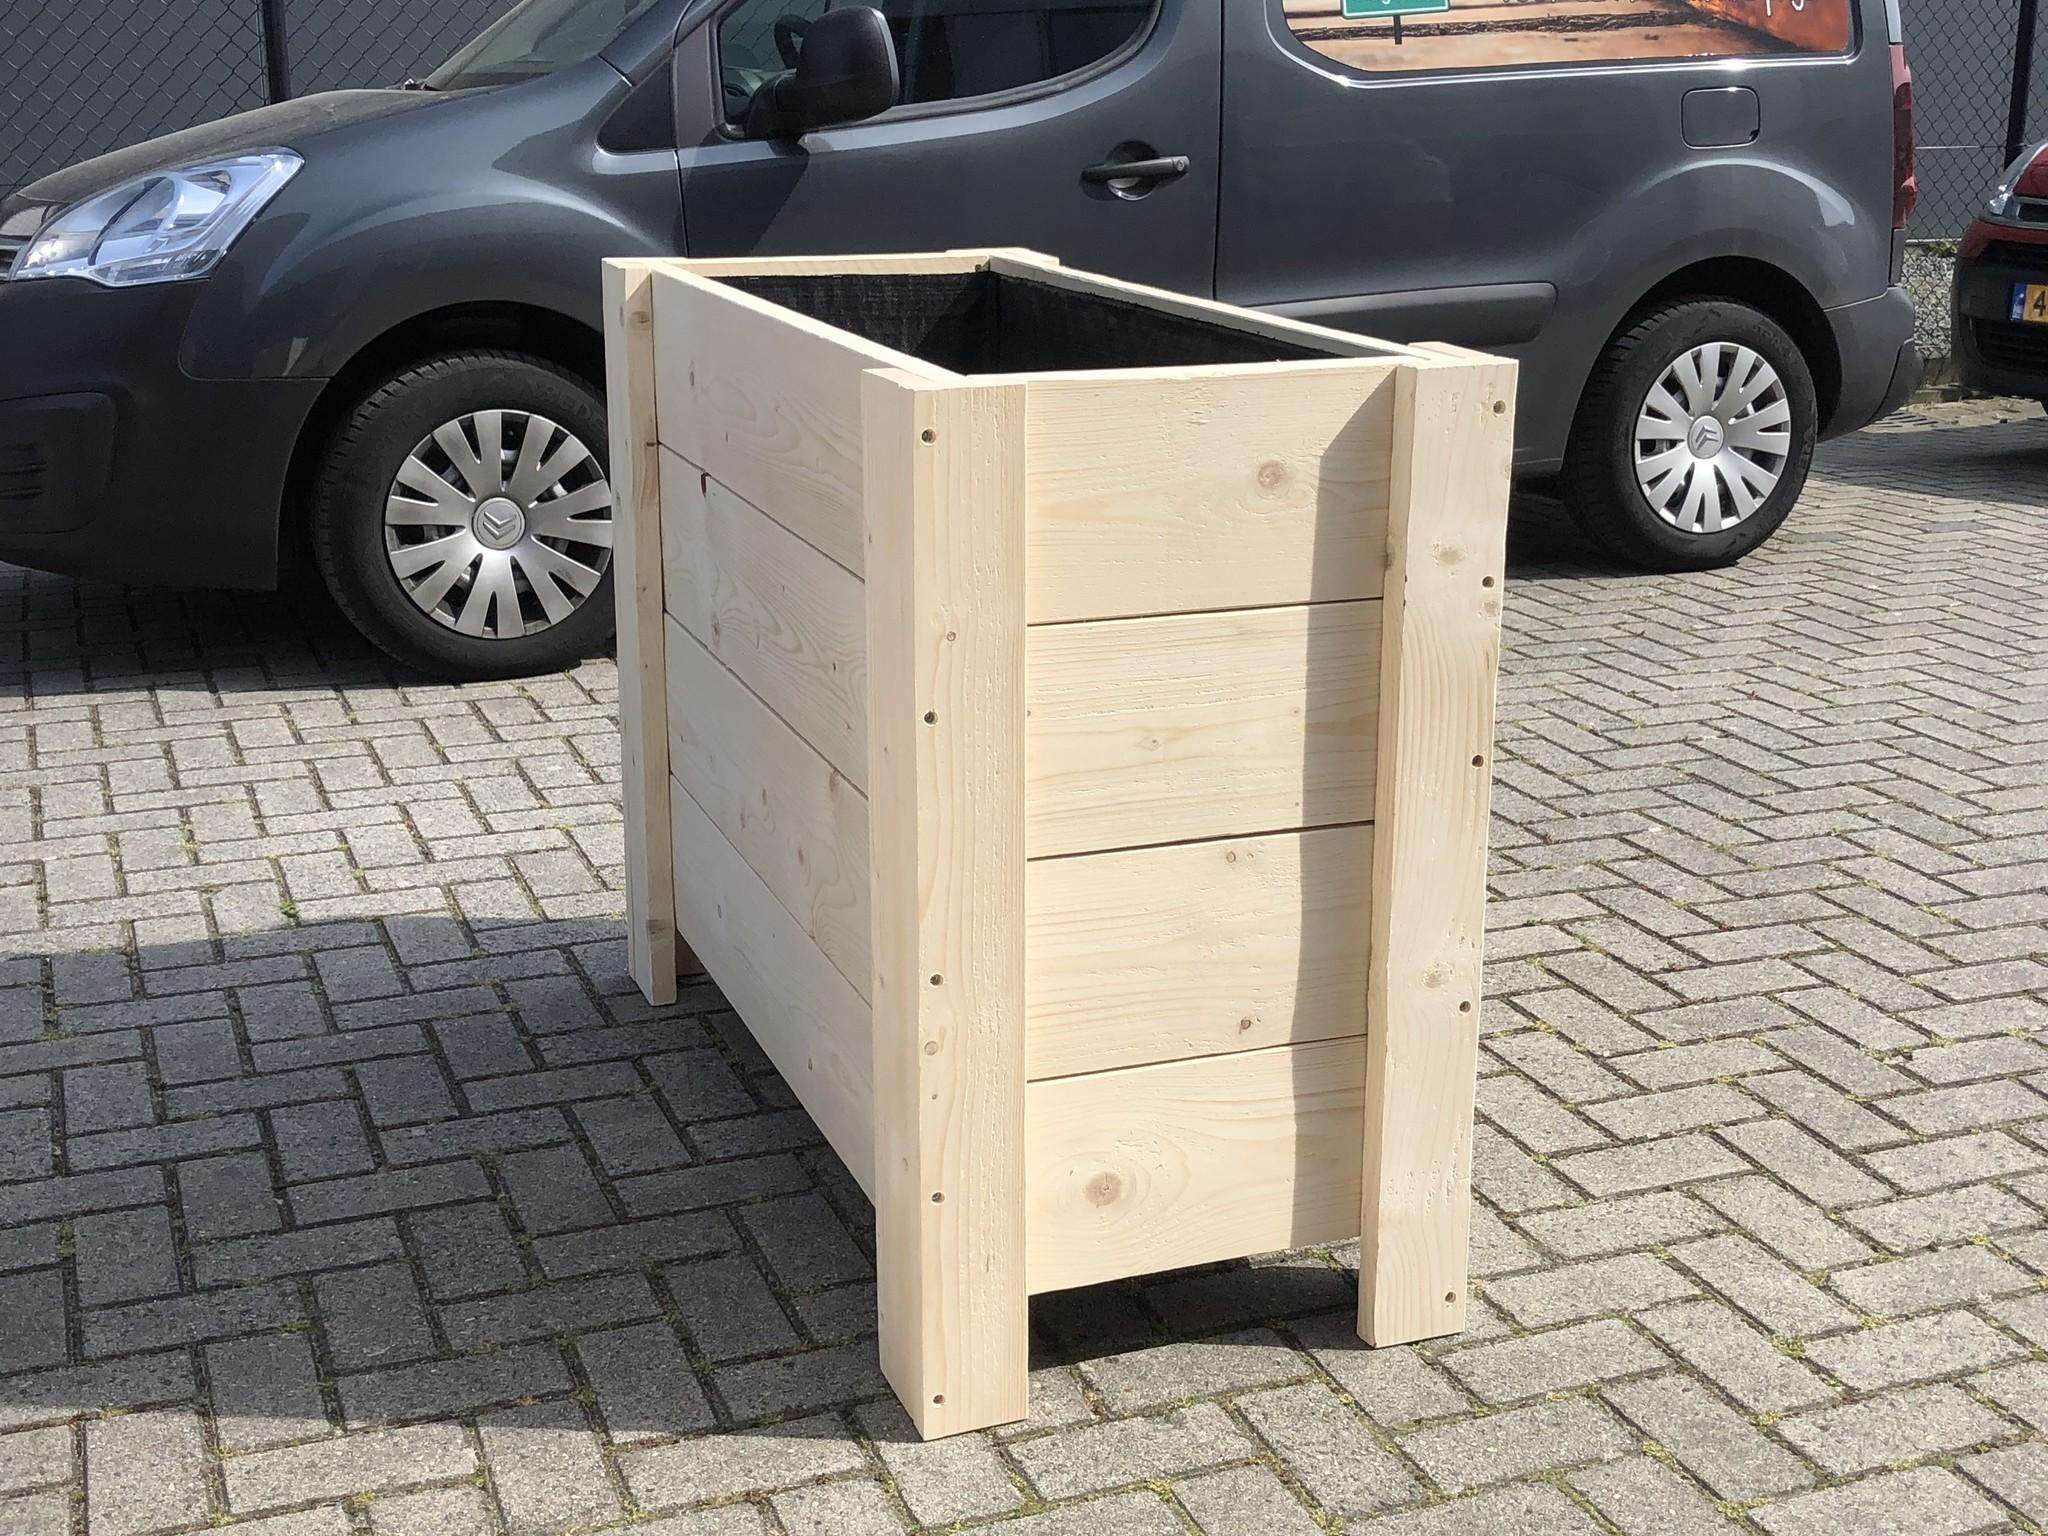 Hirs Plantenbak / Bloembak van steigerhout XL: Model Hirs